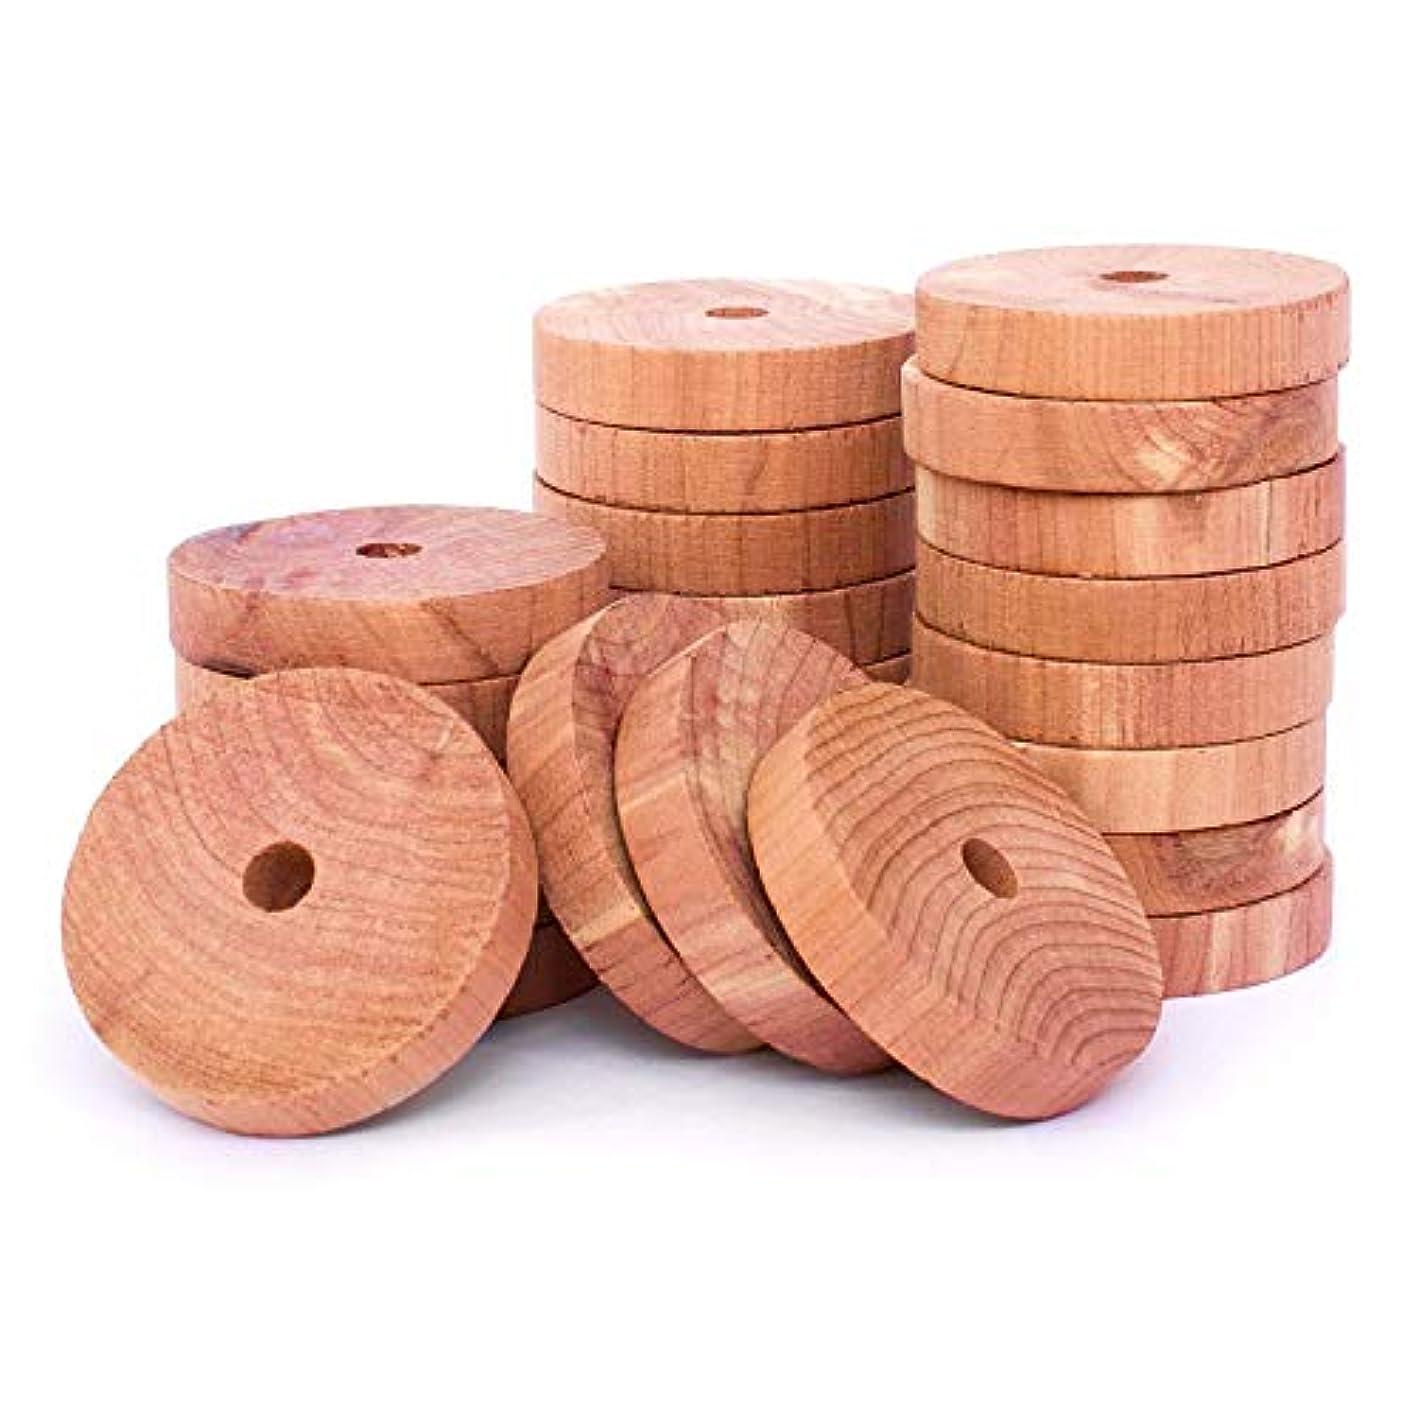 HomeDo Cedar Blocks for Clothes Storage, Cedar Closet Moth Protection with Cedar Fragrance, Cedar Rings Hangers for Closets and Drawers (Cedar Round Ring, 30)